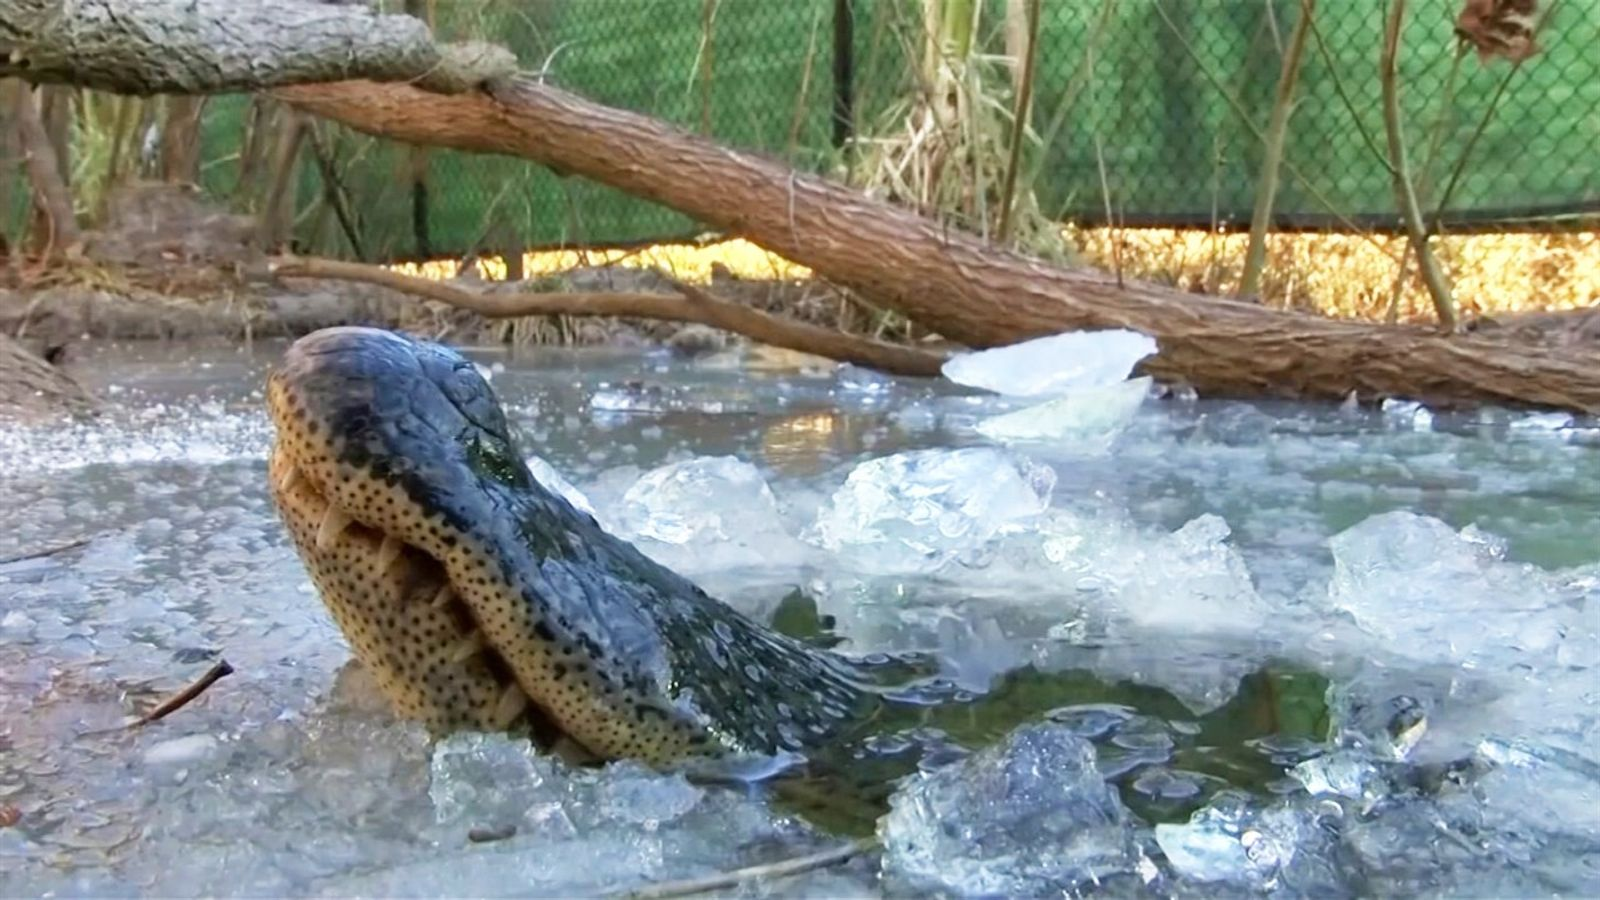 Jacarés 'congelados' respiram através do gelo para sobreviver